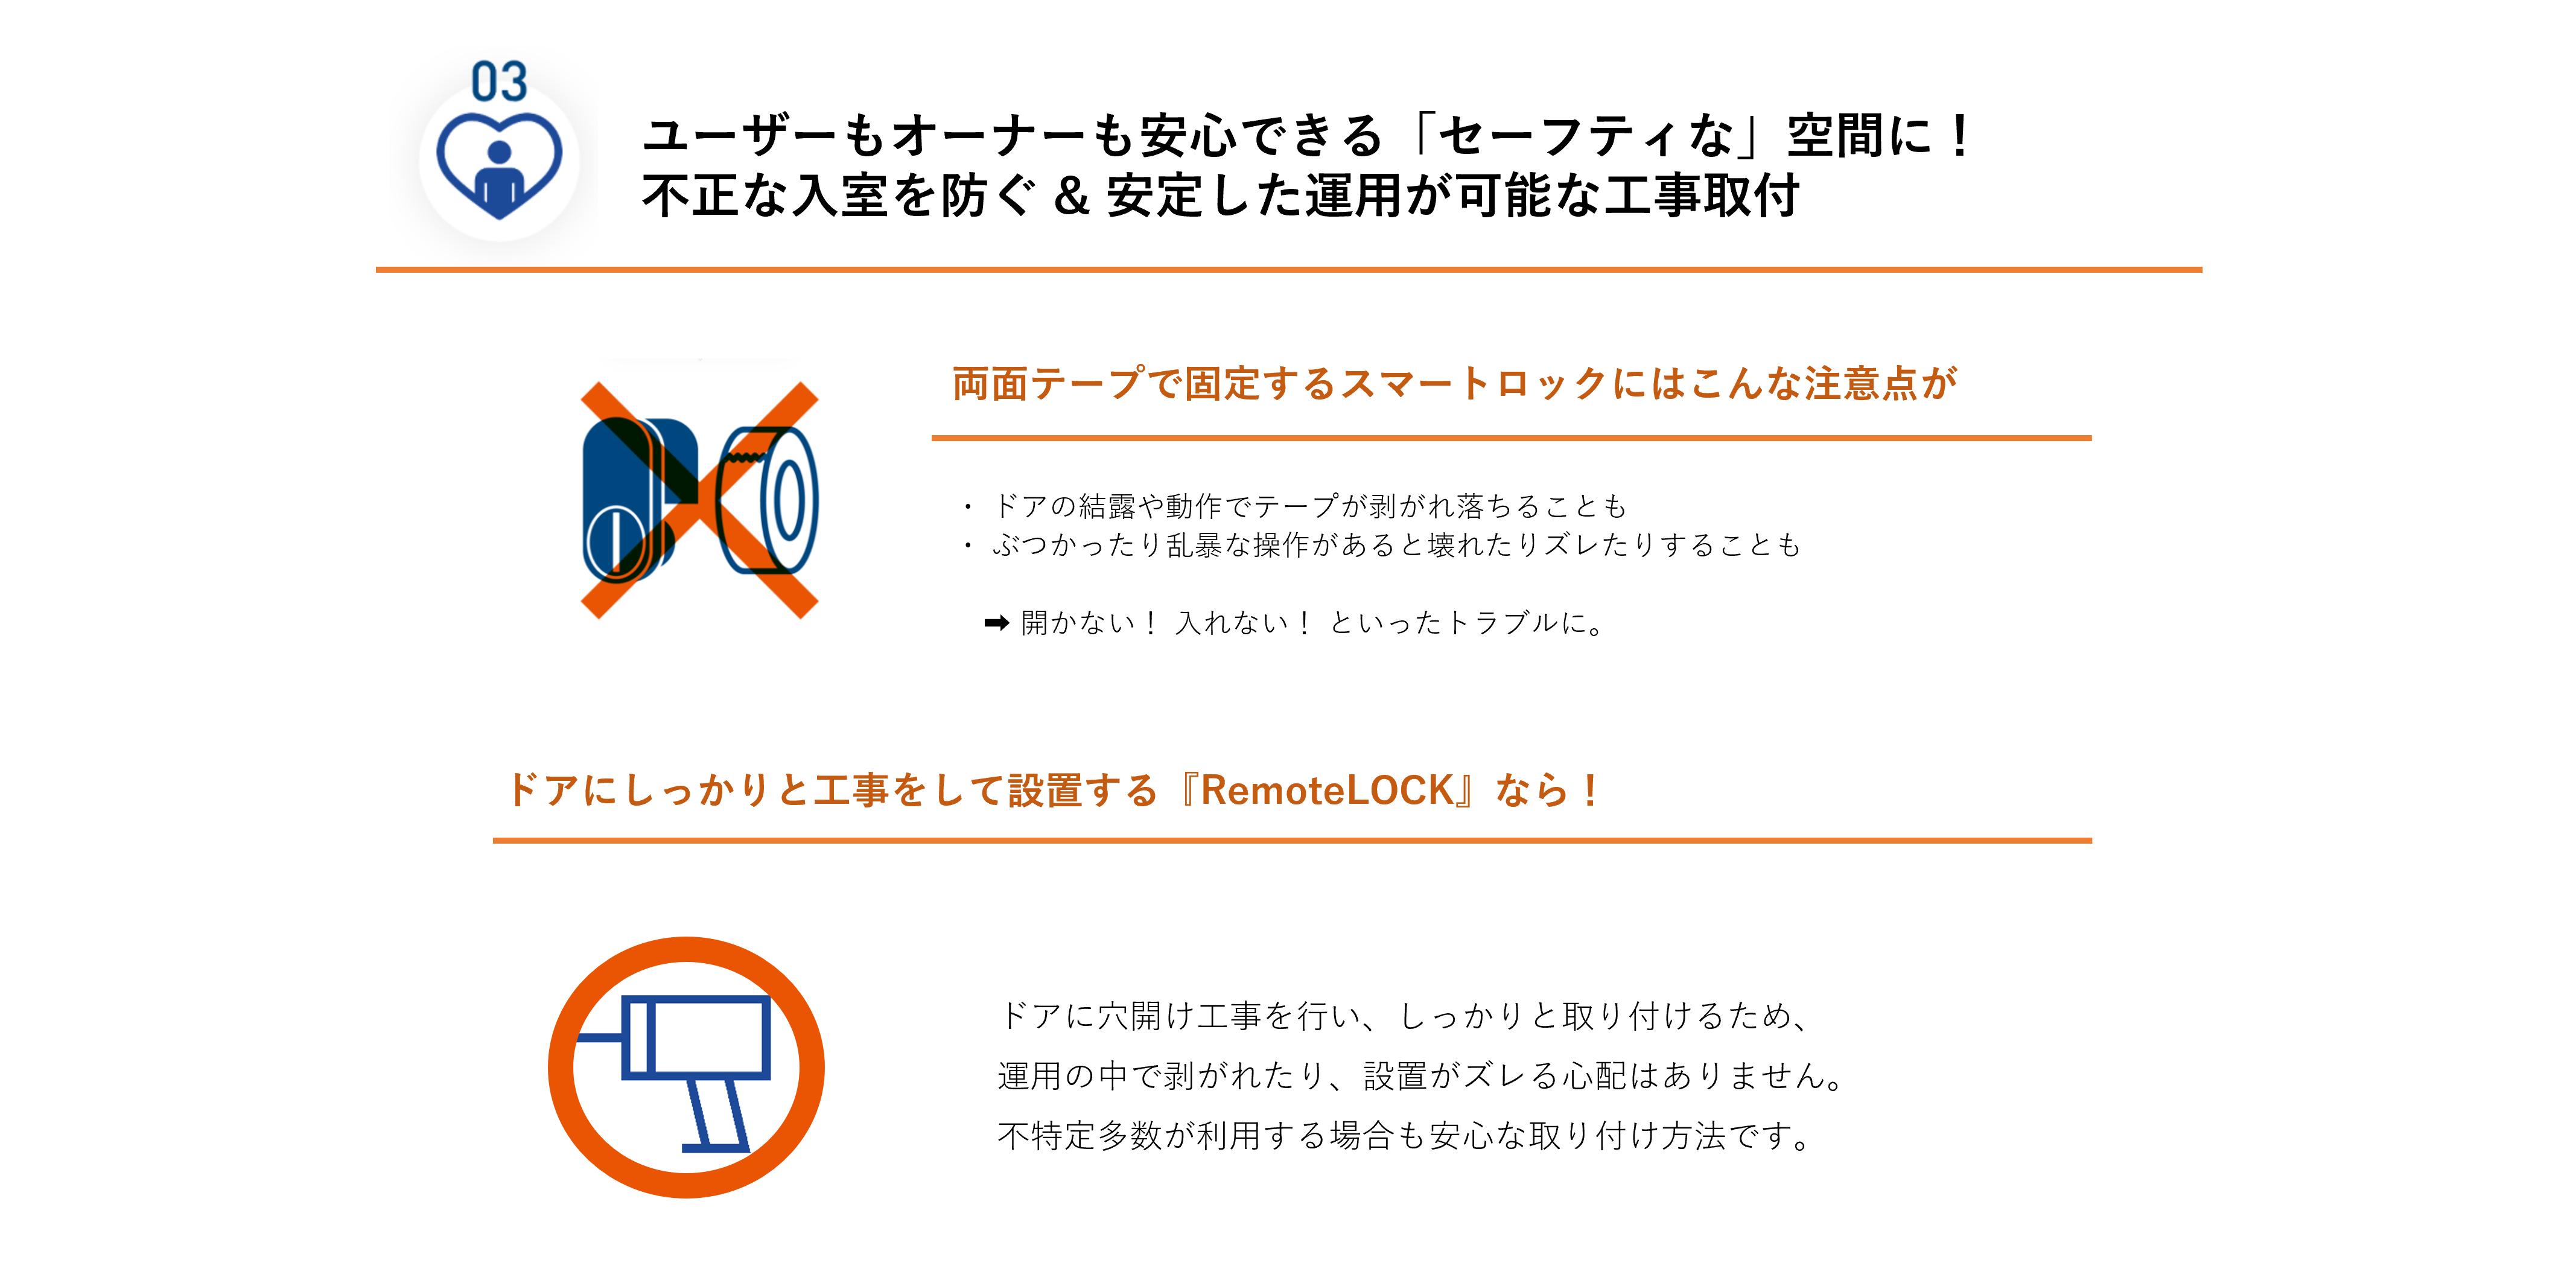 rental-space-remotelock-03-1